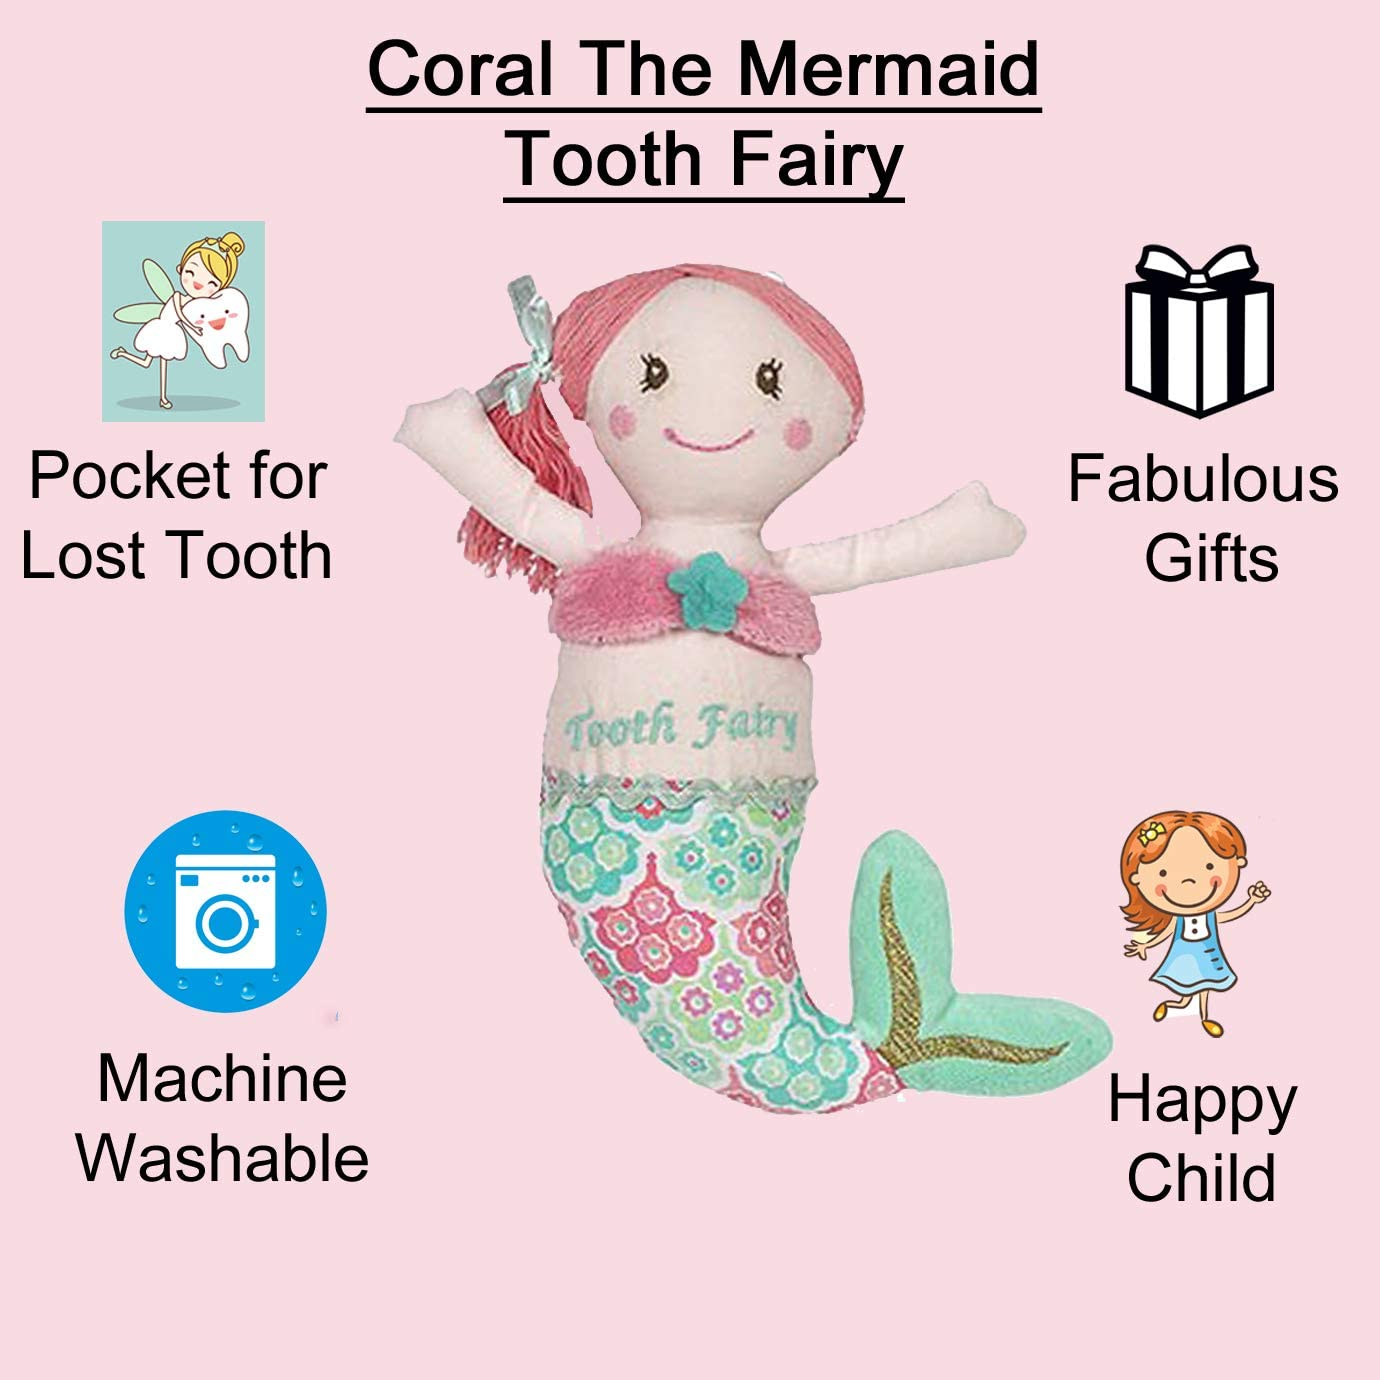 Maison Chic Coral the Mermaid Purse